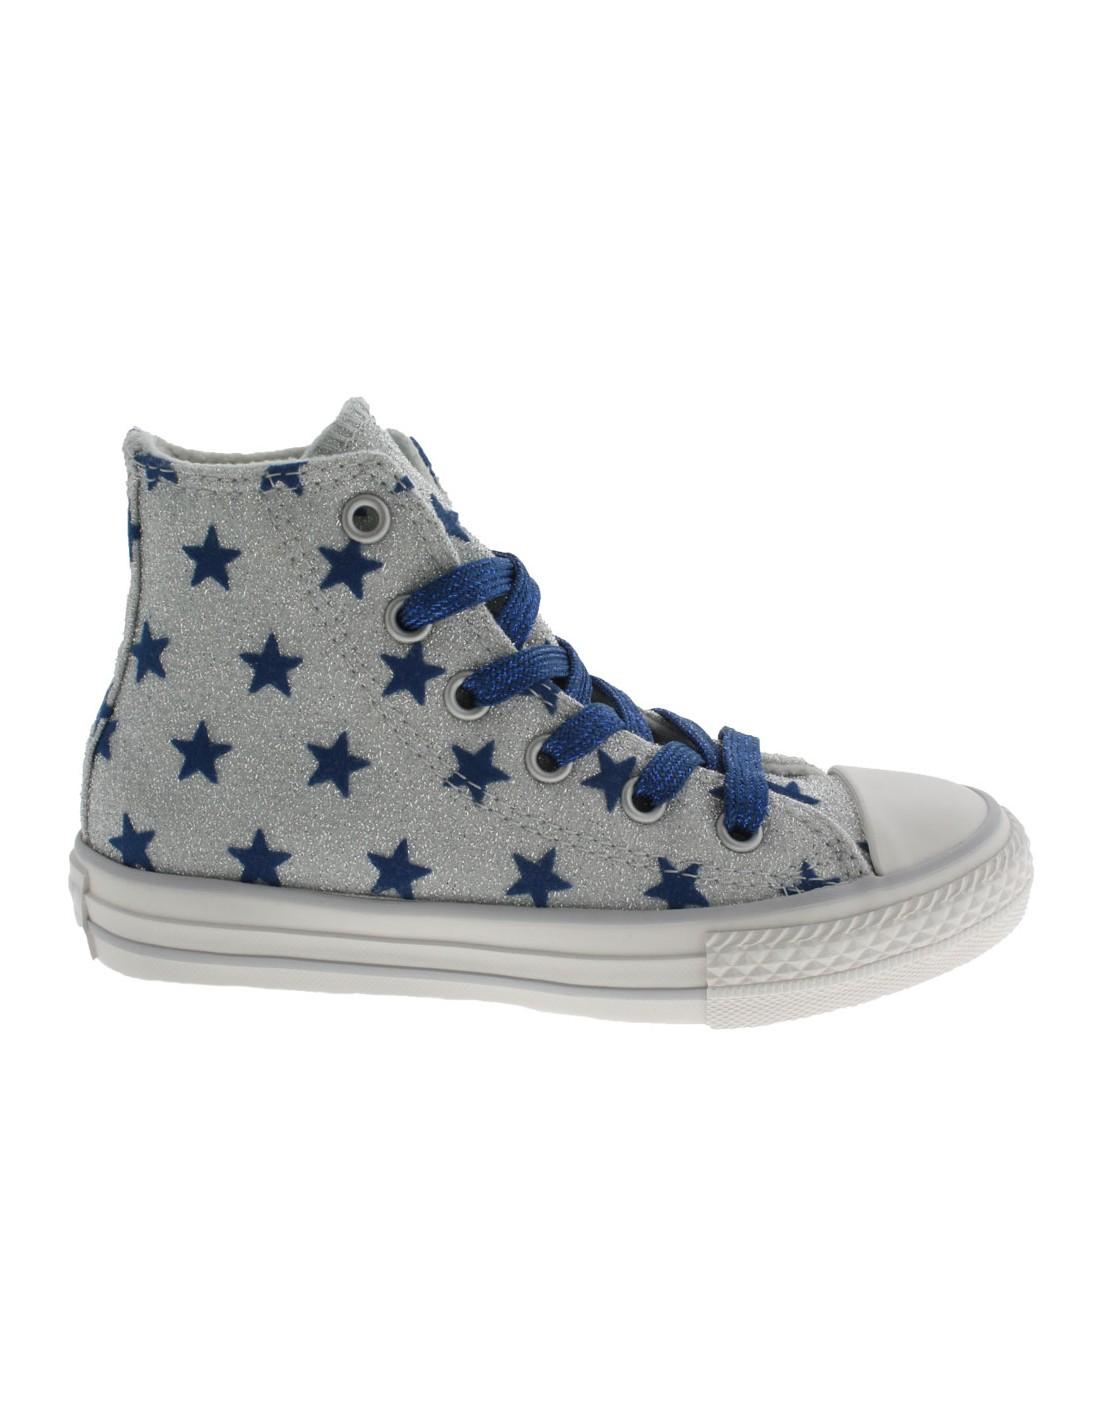 scarpe converse bambina offerta